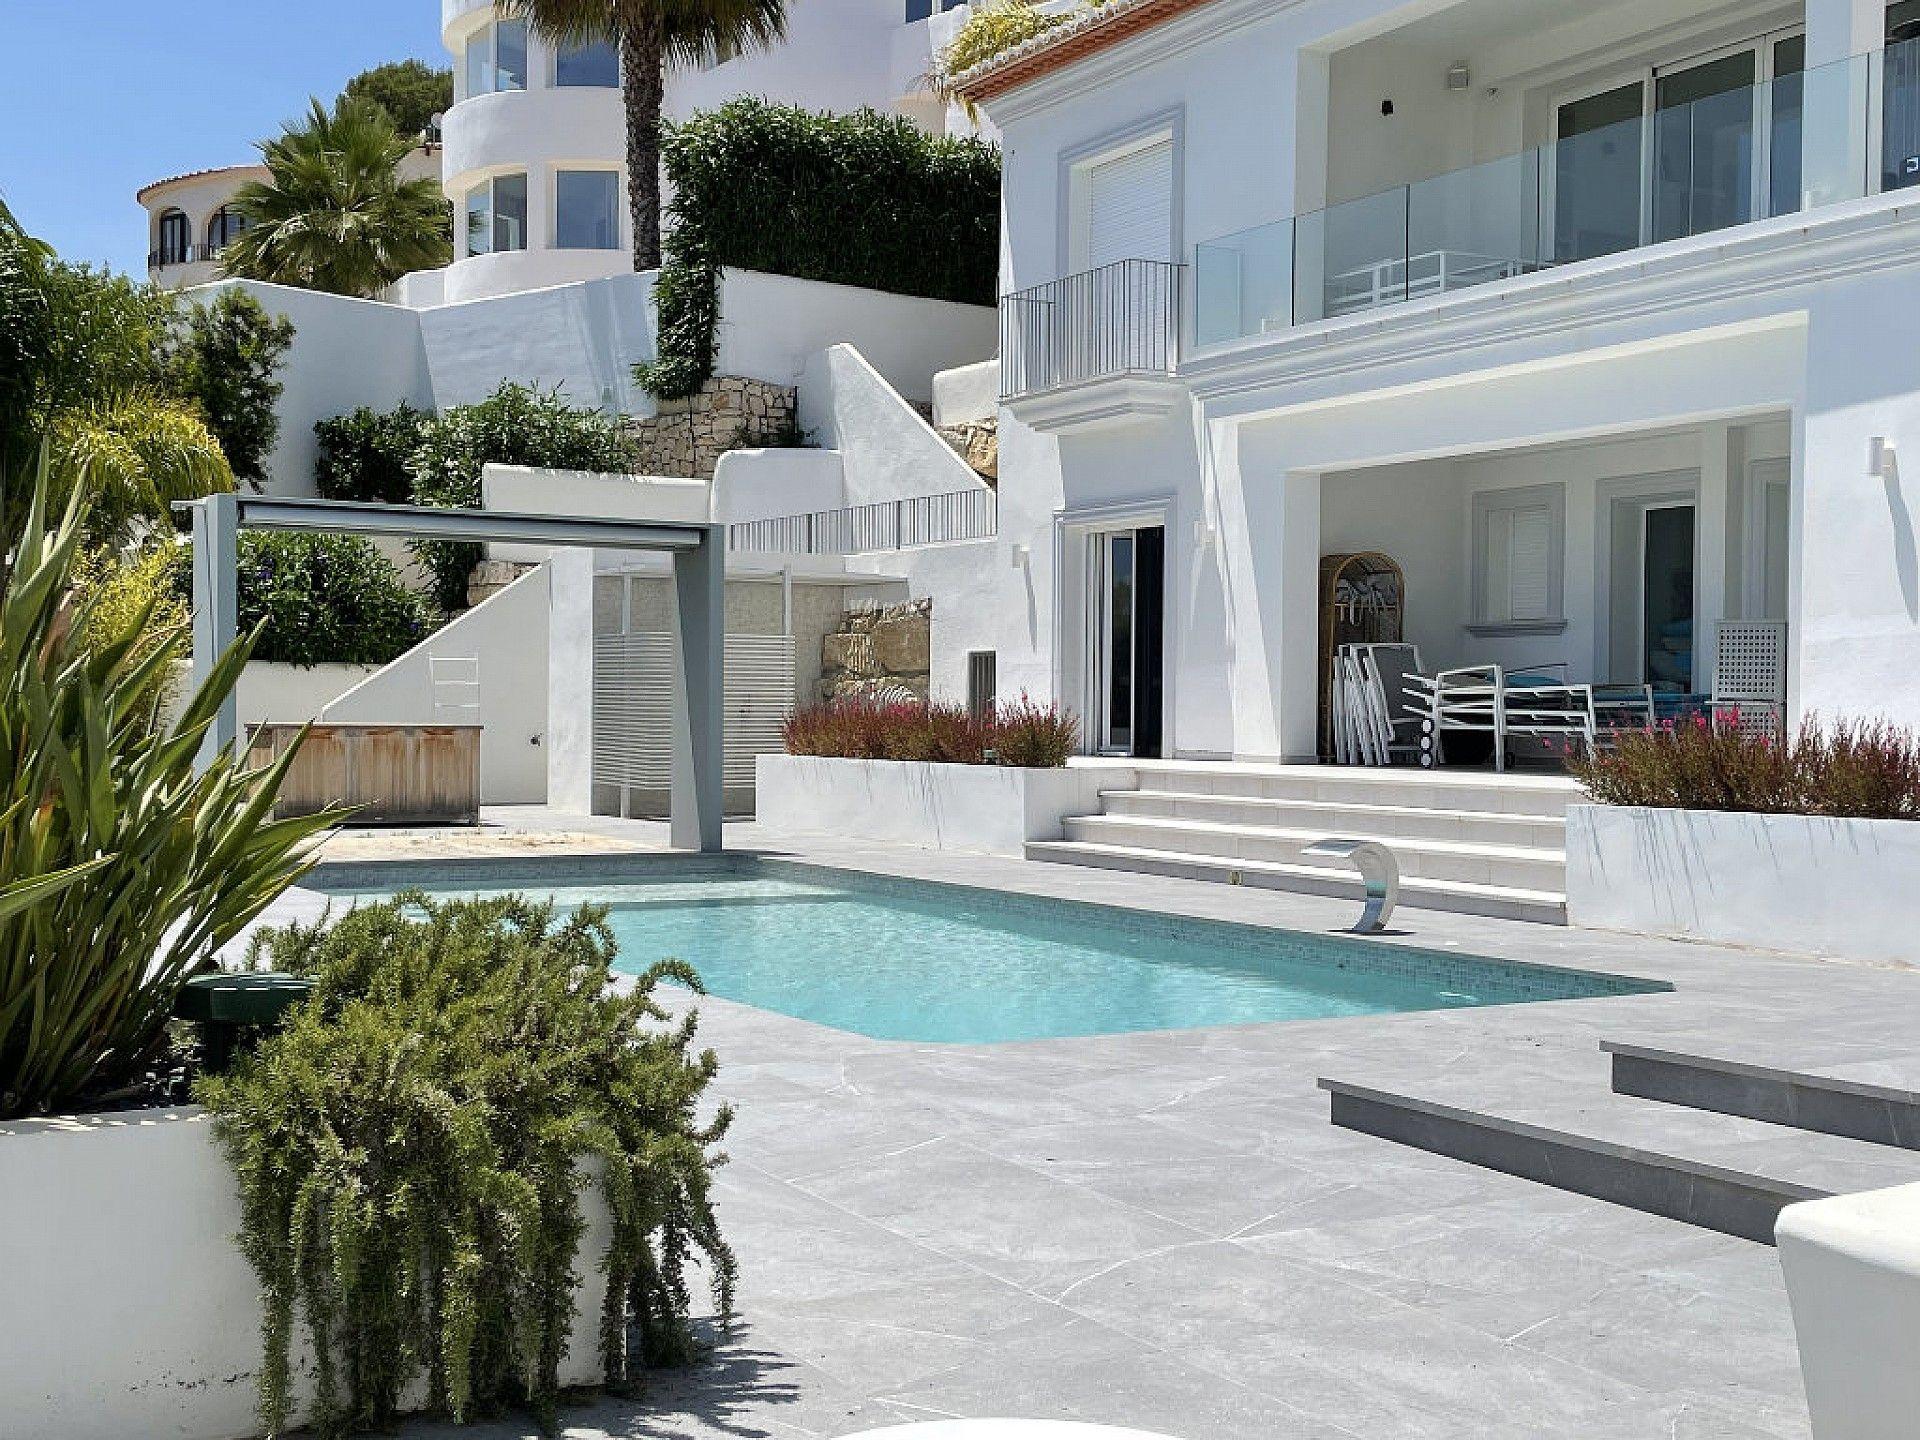 w_huis-tekoop-moraira-benissa-costa-blanca-zeezicht-spanje-00115-1.jpg